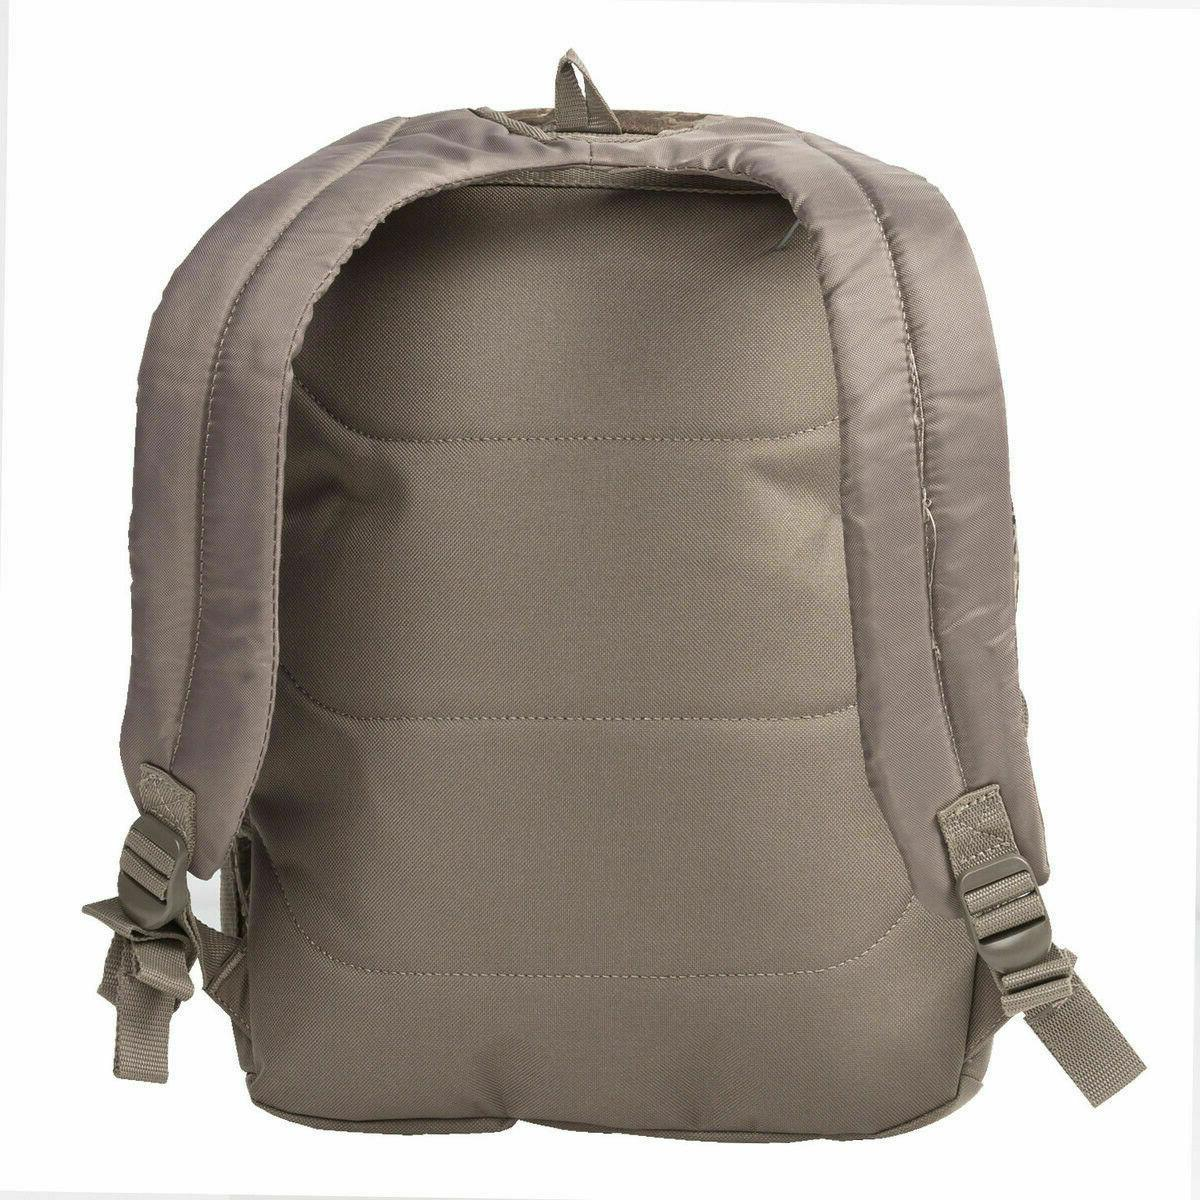 Fieldline Pro Series Backpack Realtree